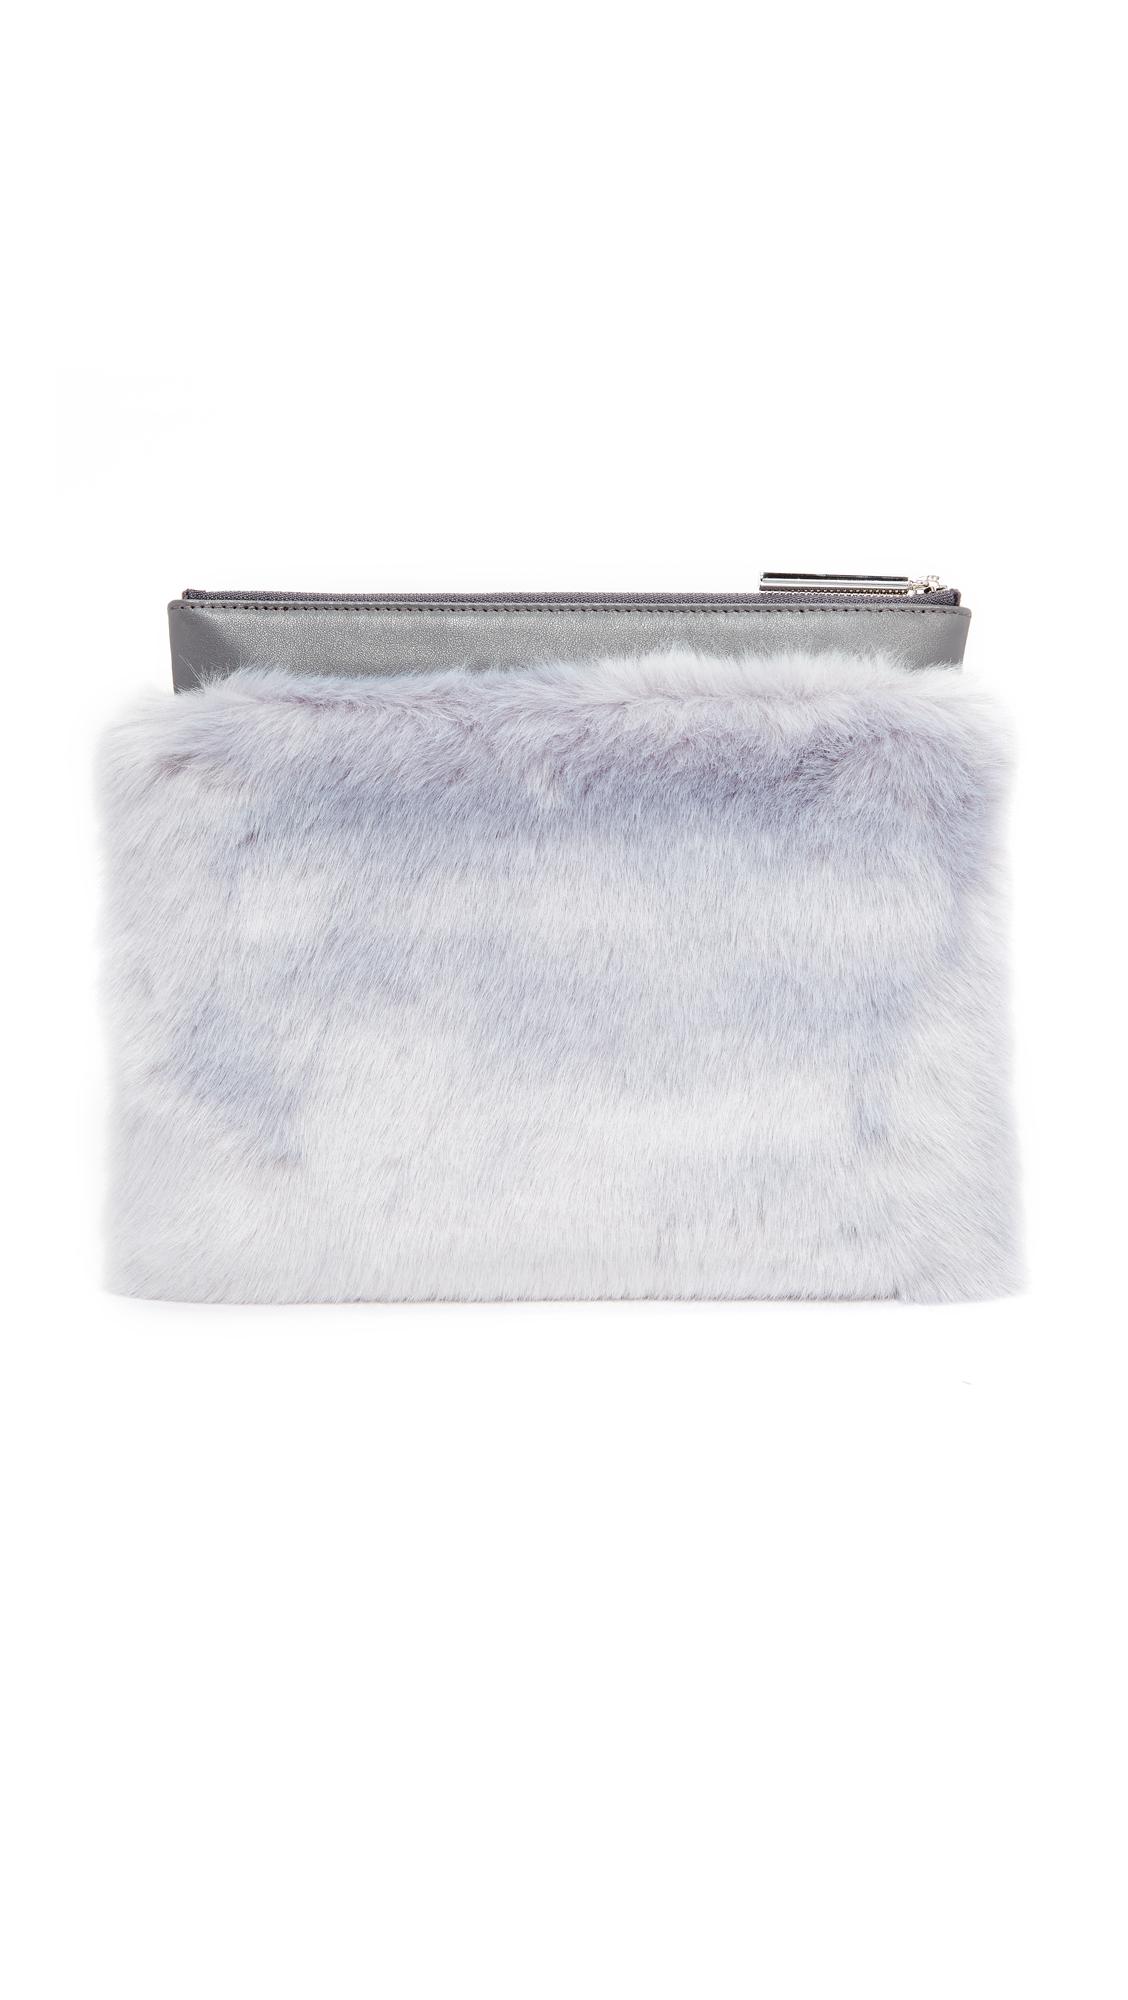 MILMA Detachable Faux Fur Clutch - Grey/Grey